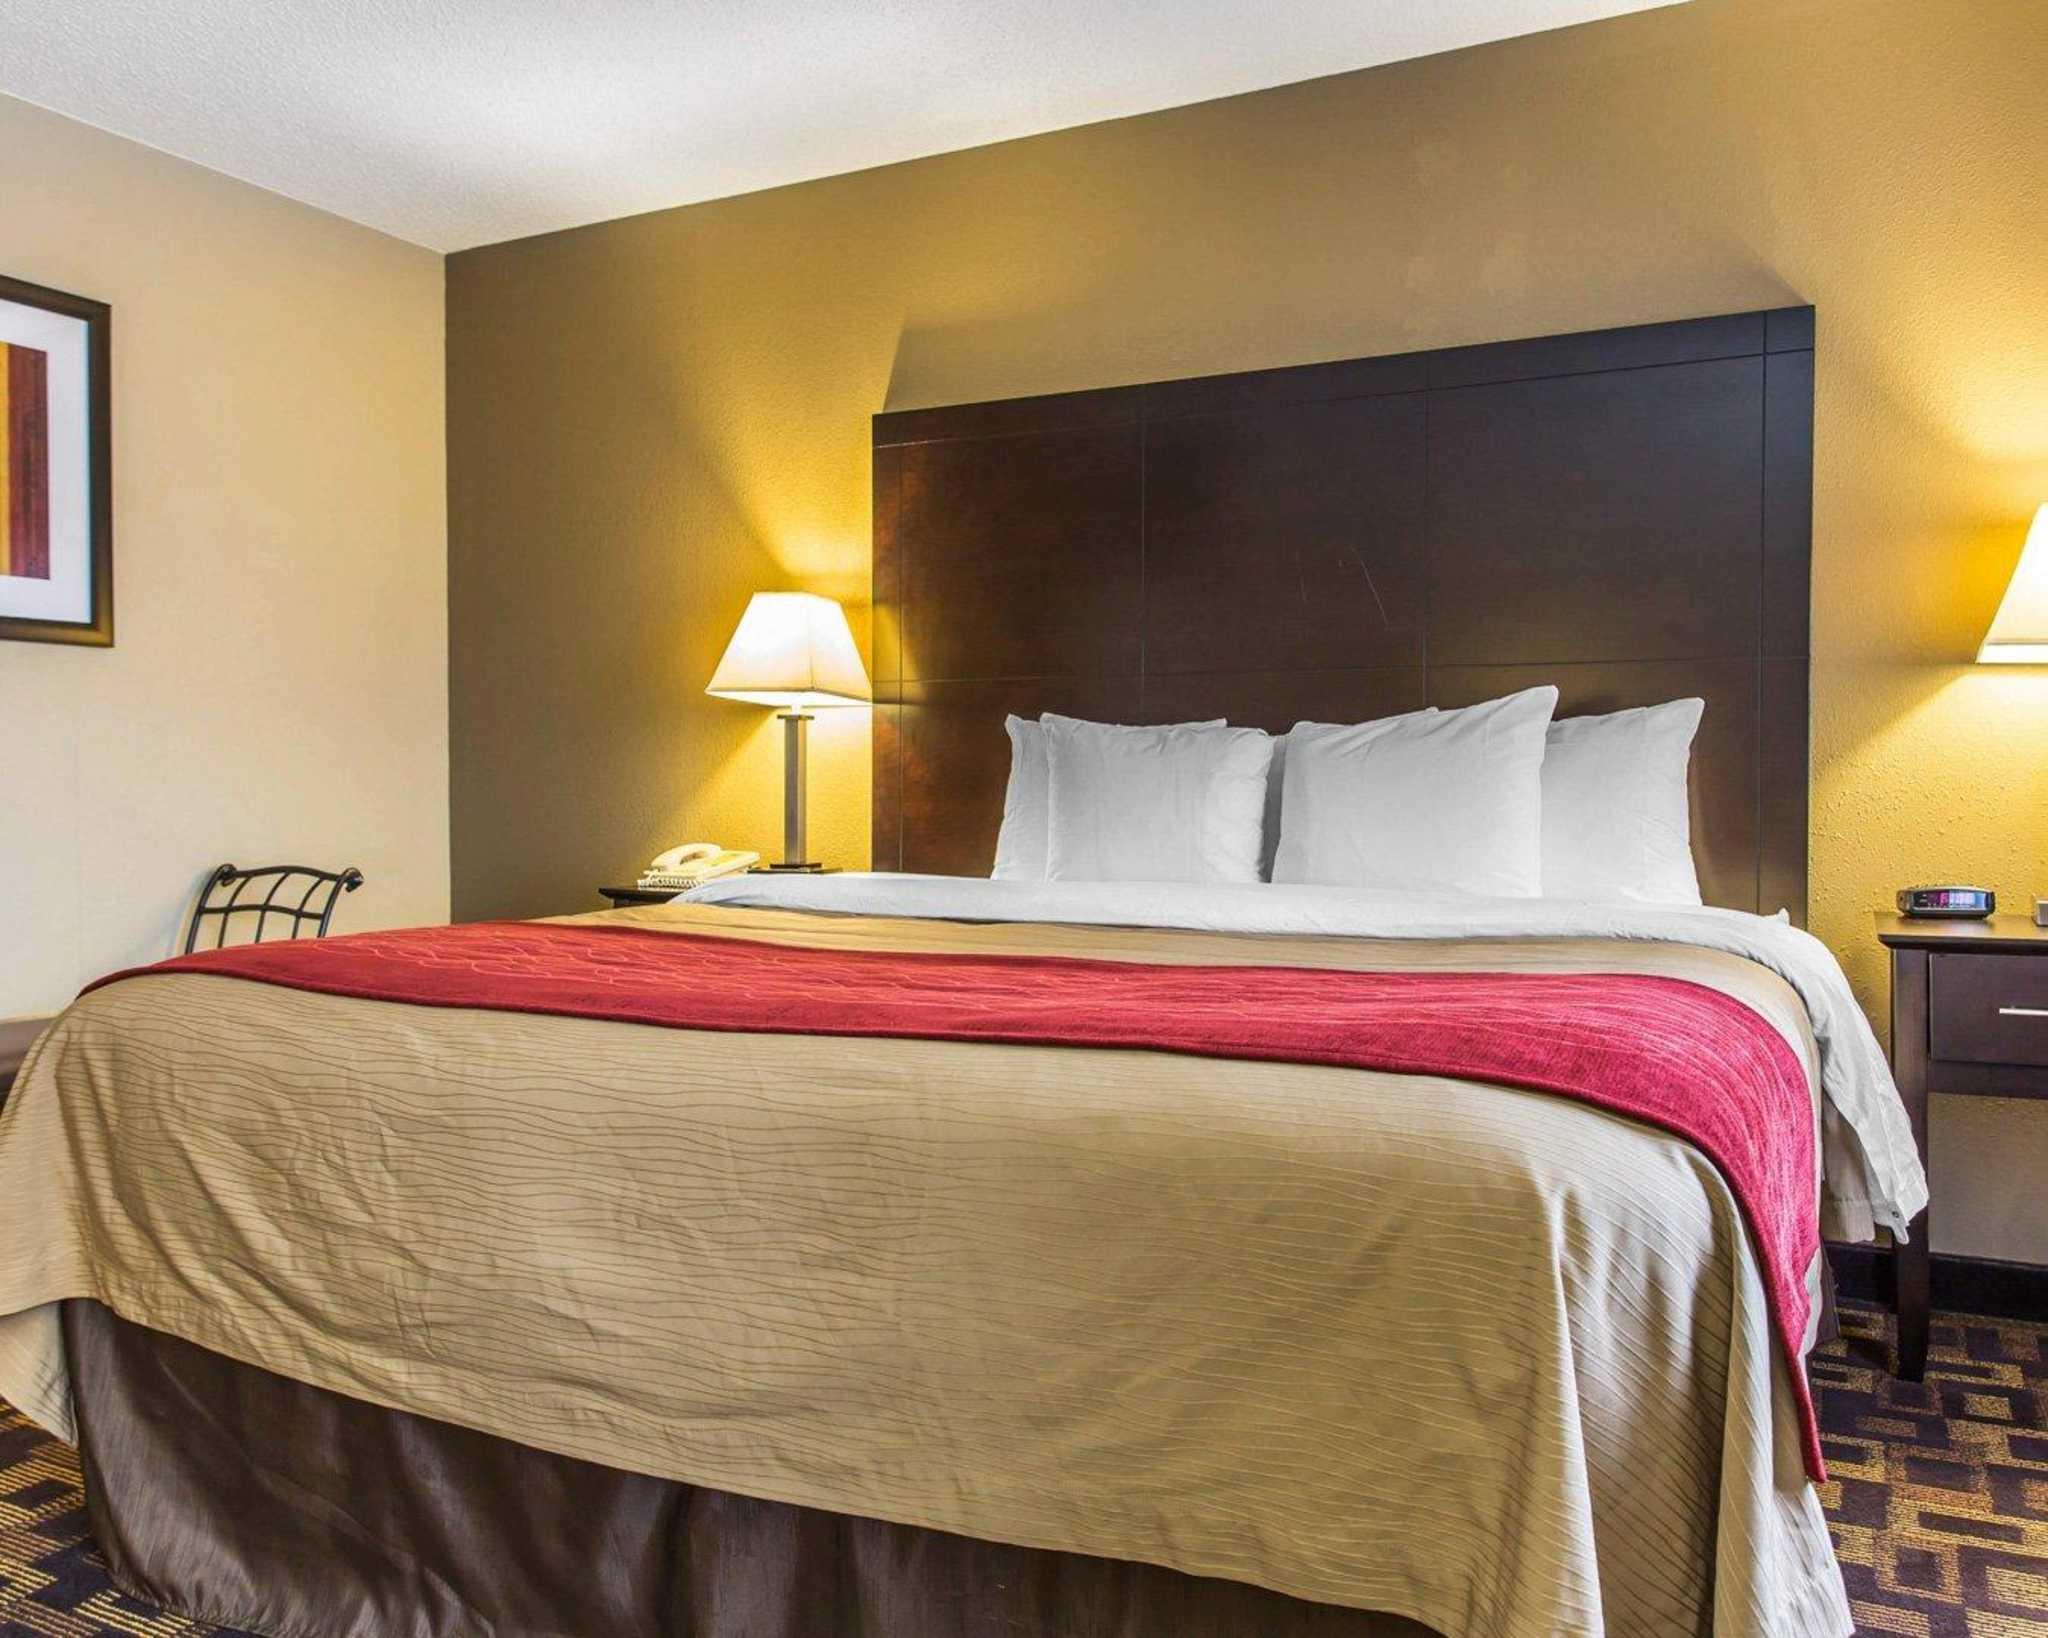 Quality Inn Lincolnton North Carolina Localdatabase Com